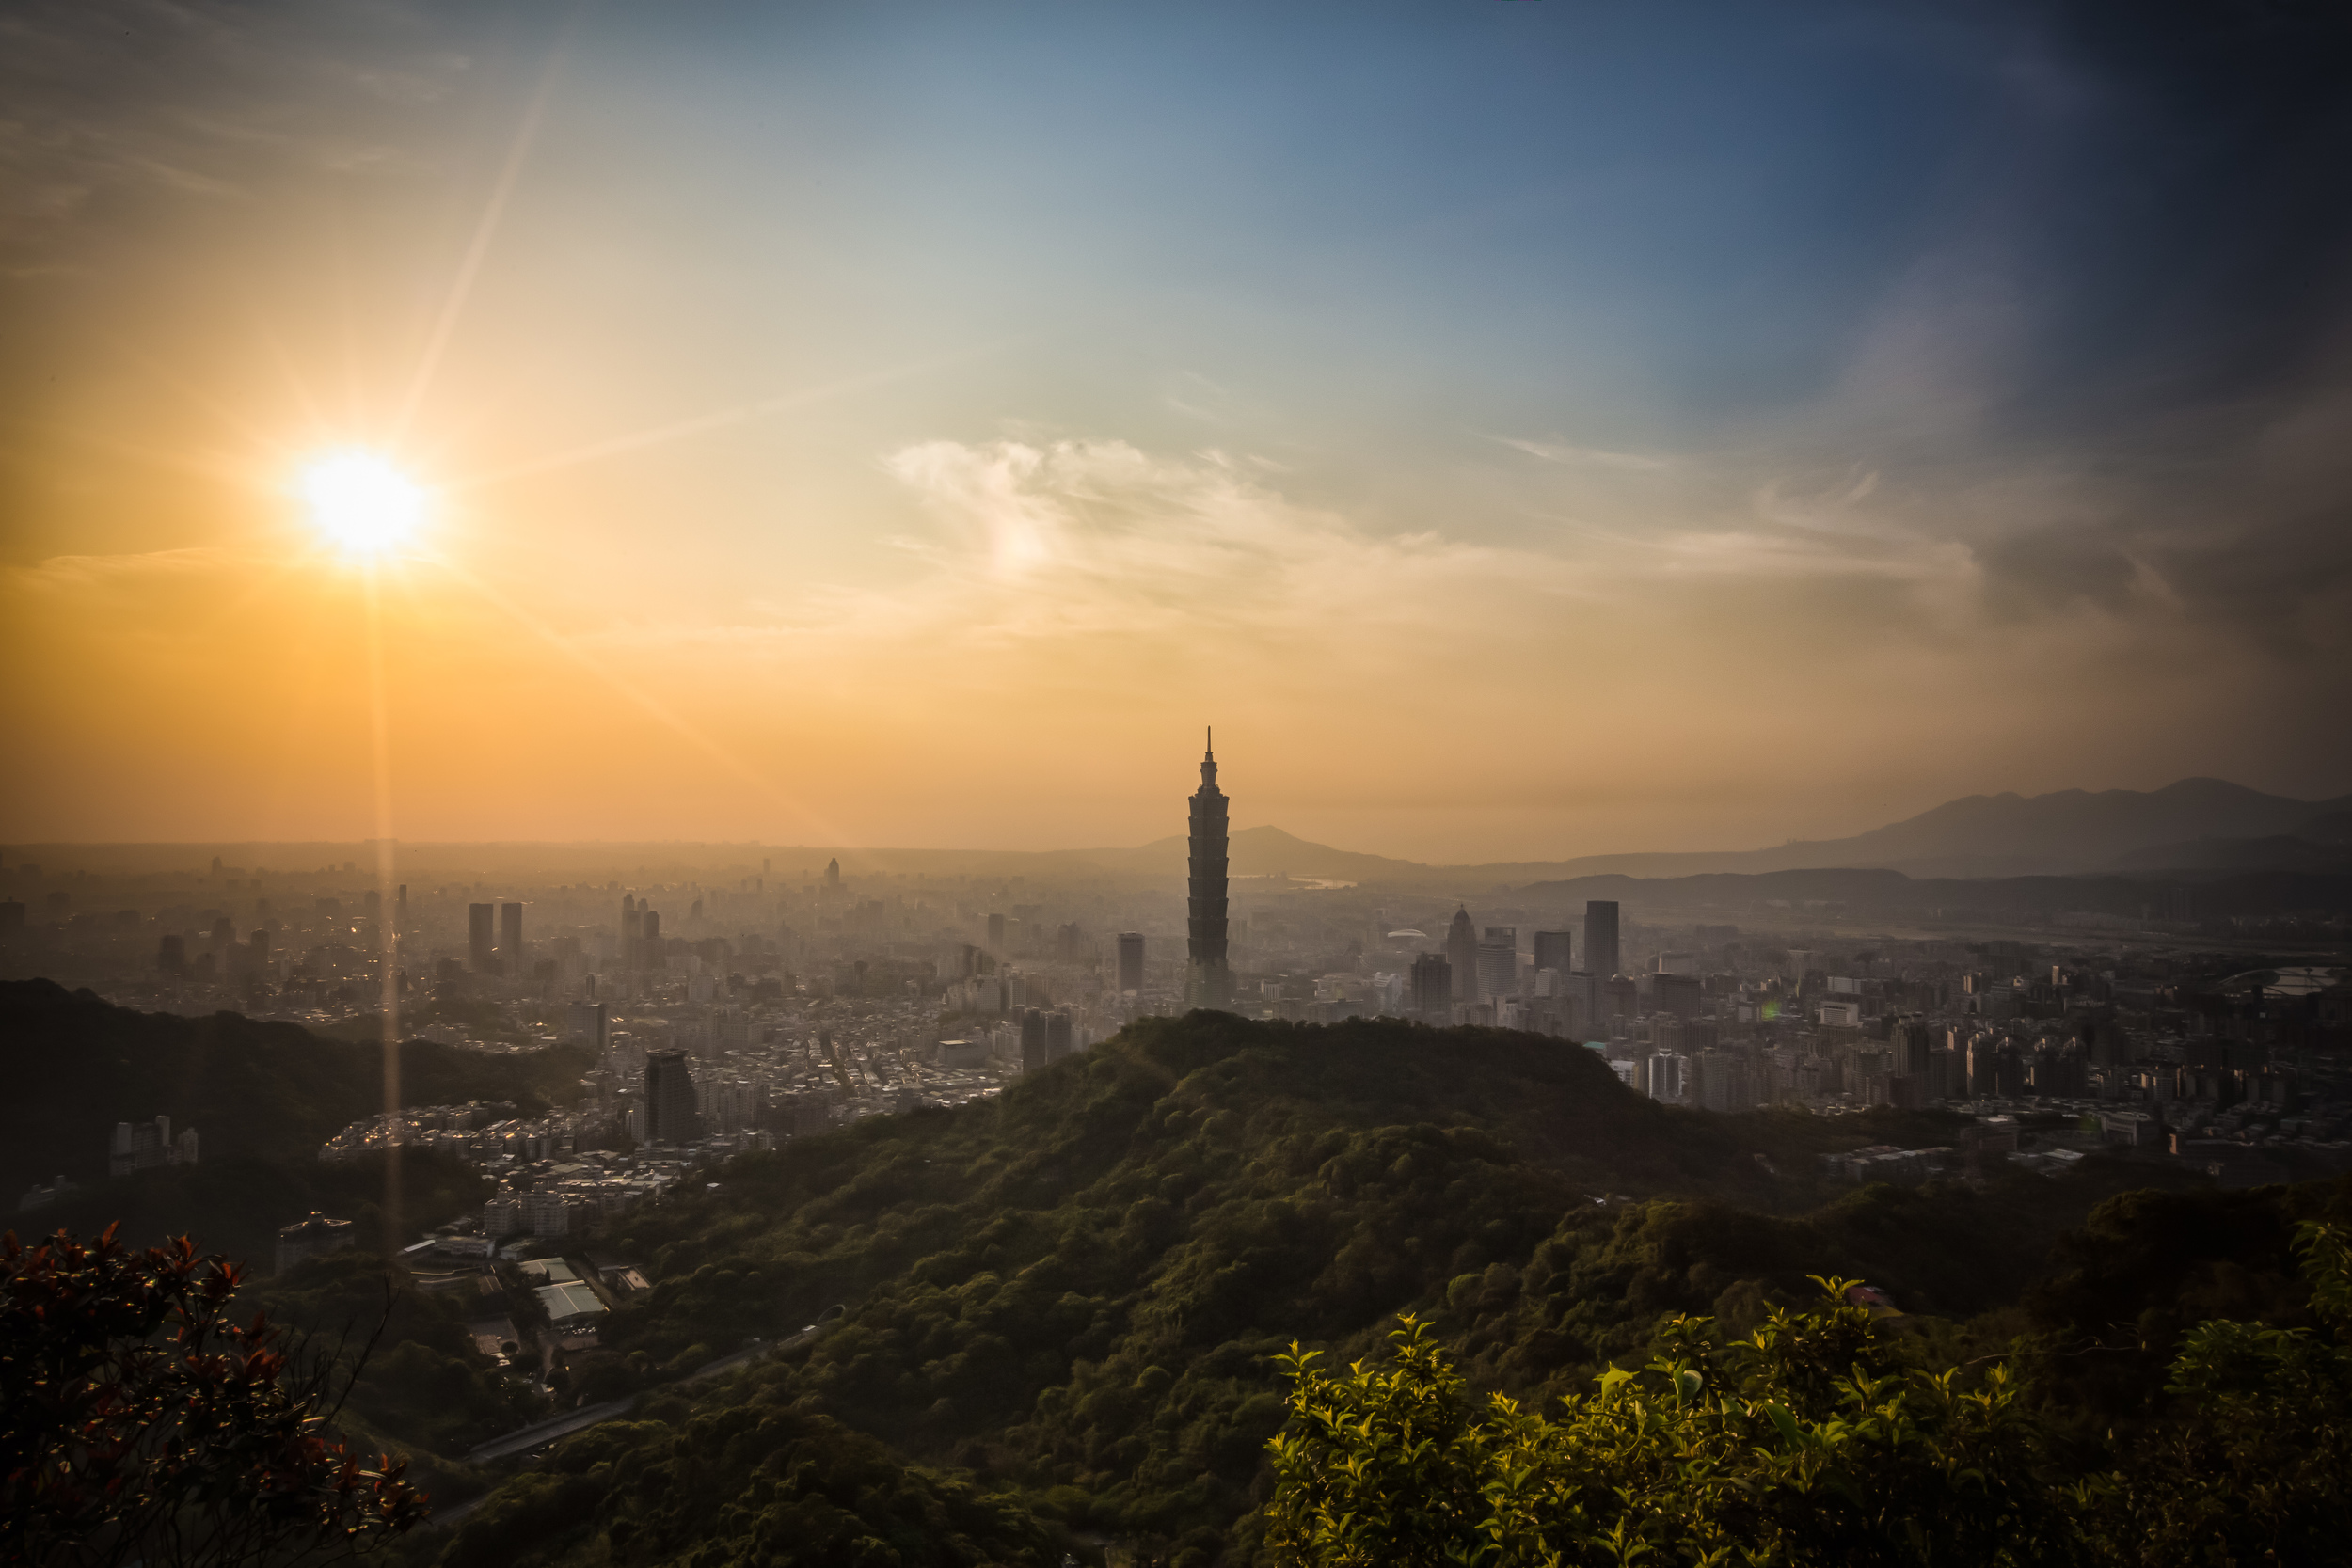 Sunset from Thumb Mountain (拇指山)